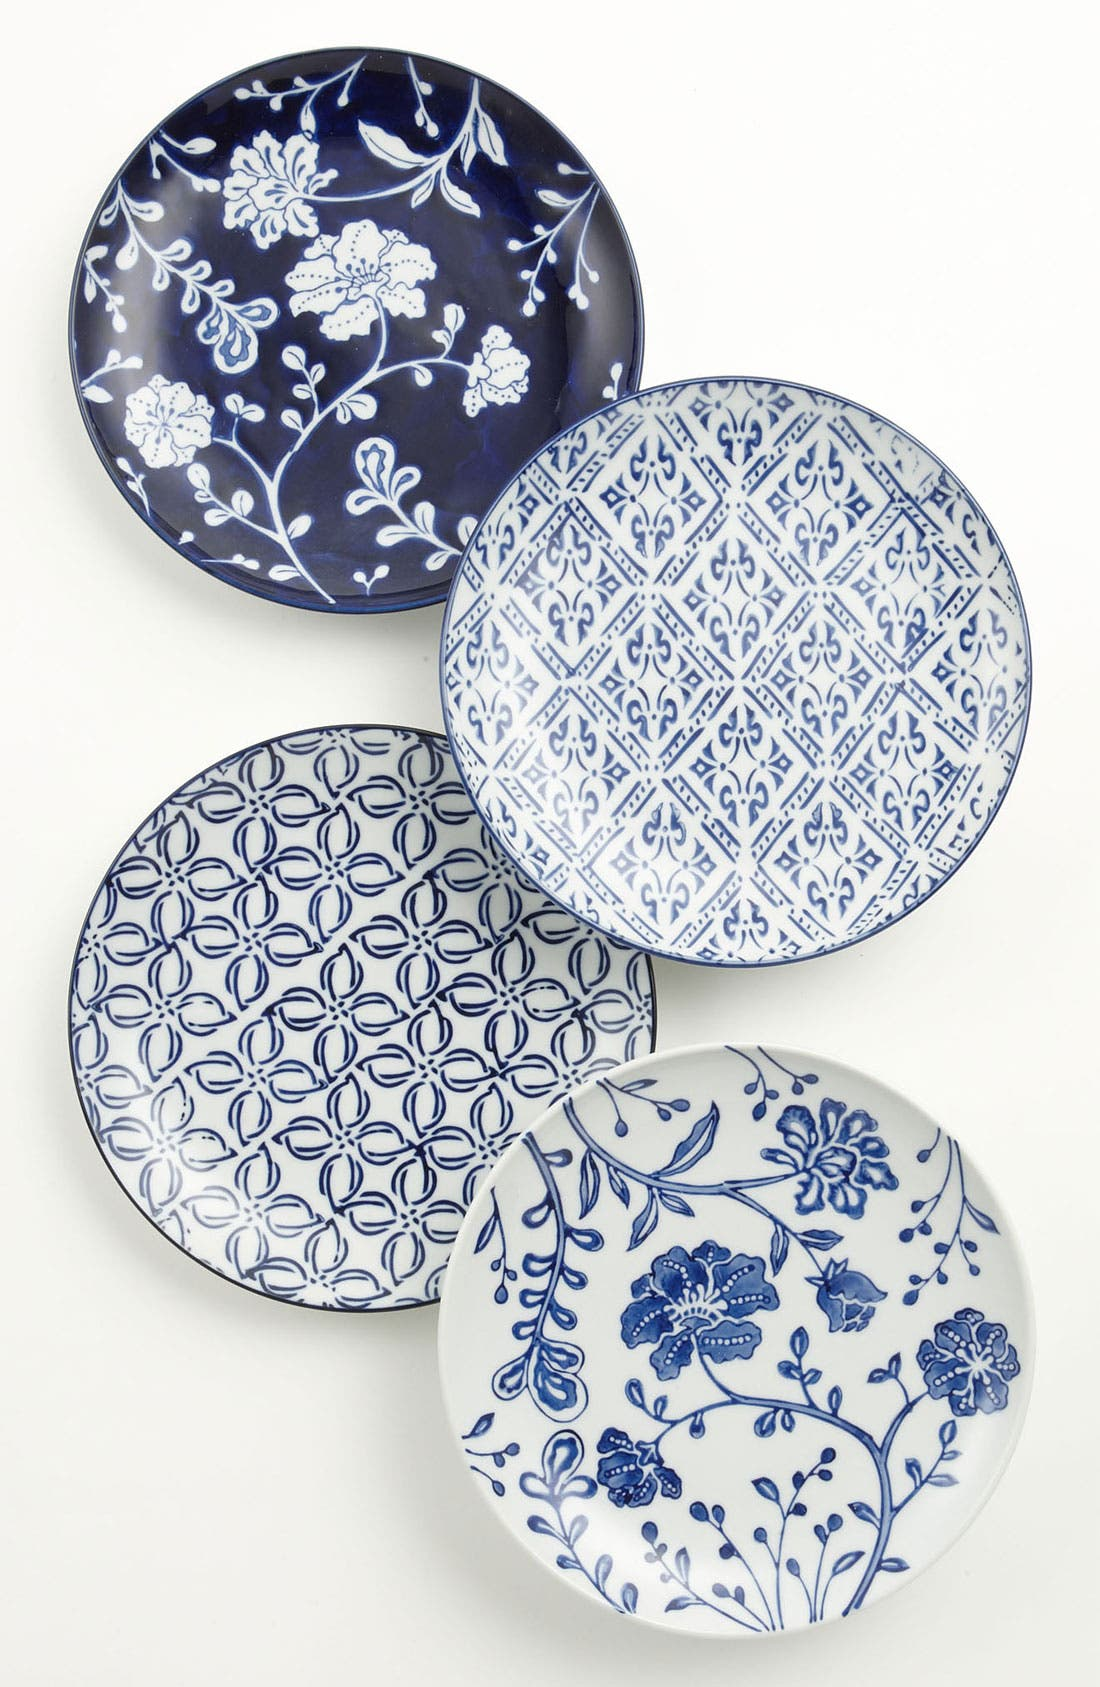 Alternate Image 1 Selected - Mixed Pattern Dessert Plates (Set of 4)